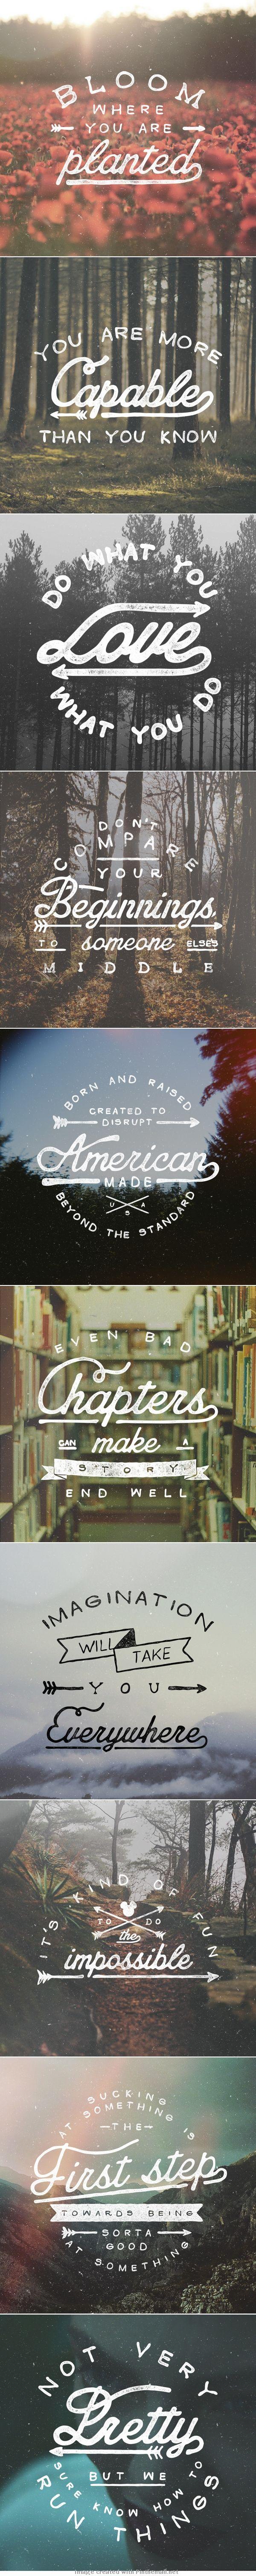 hand lettering graphic type typography design vintage retro grain photo